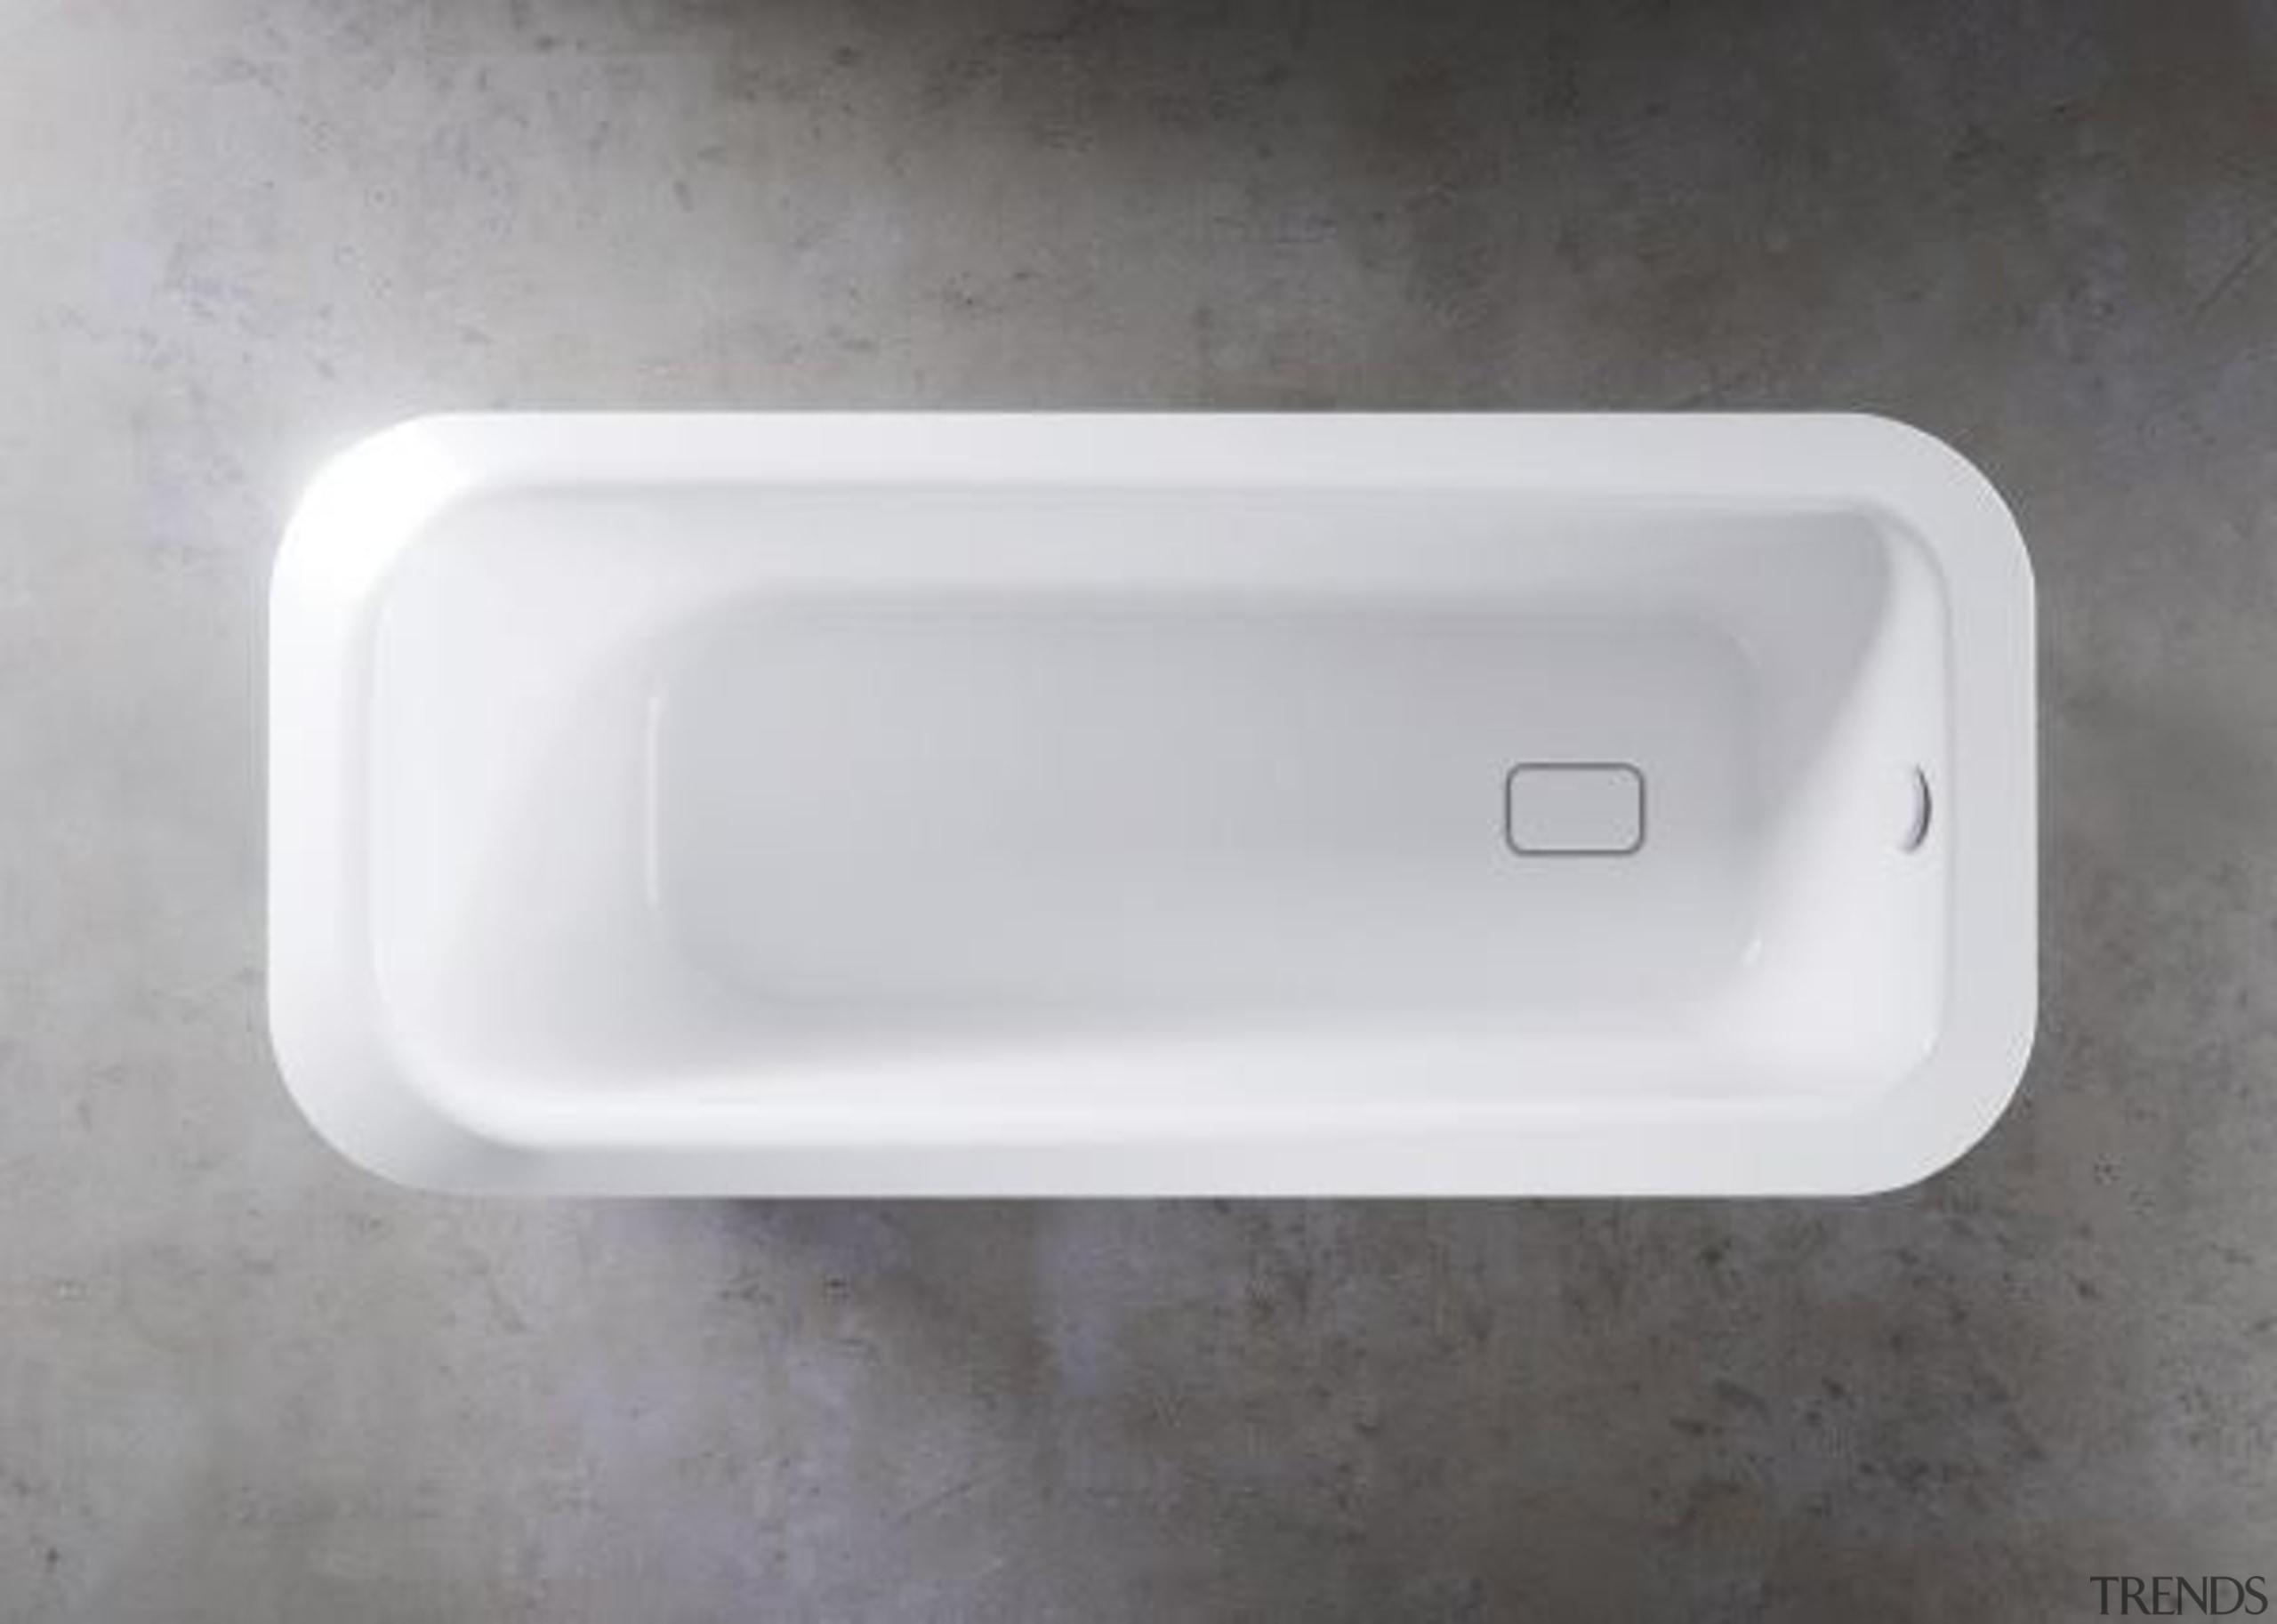 Working with star designer Arik Levy, Kaldewei has bathroom sink, bathtub, hardware, plumbing fixture, product design, sink, white, gray